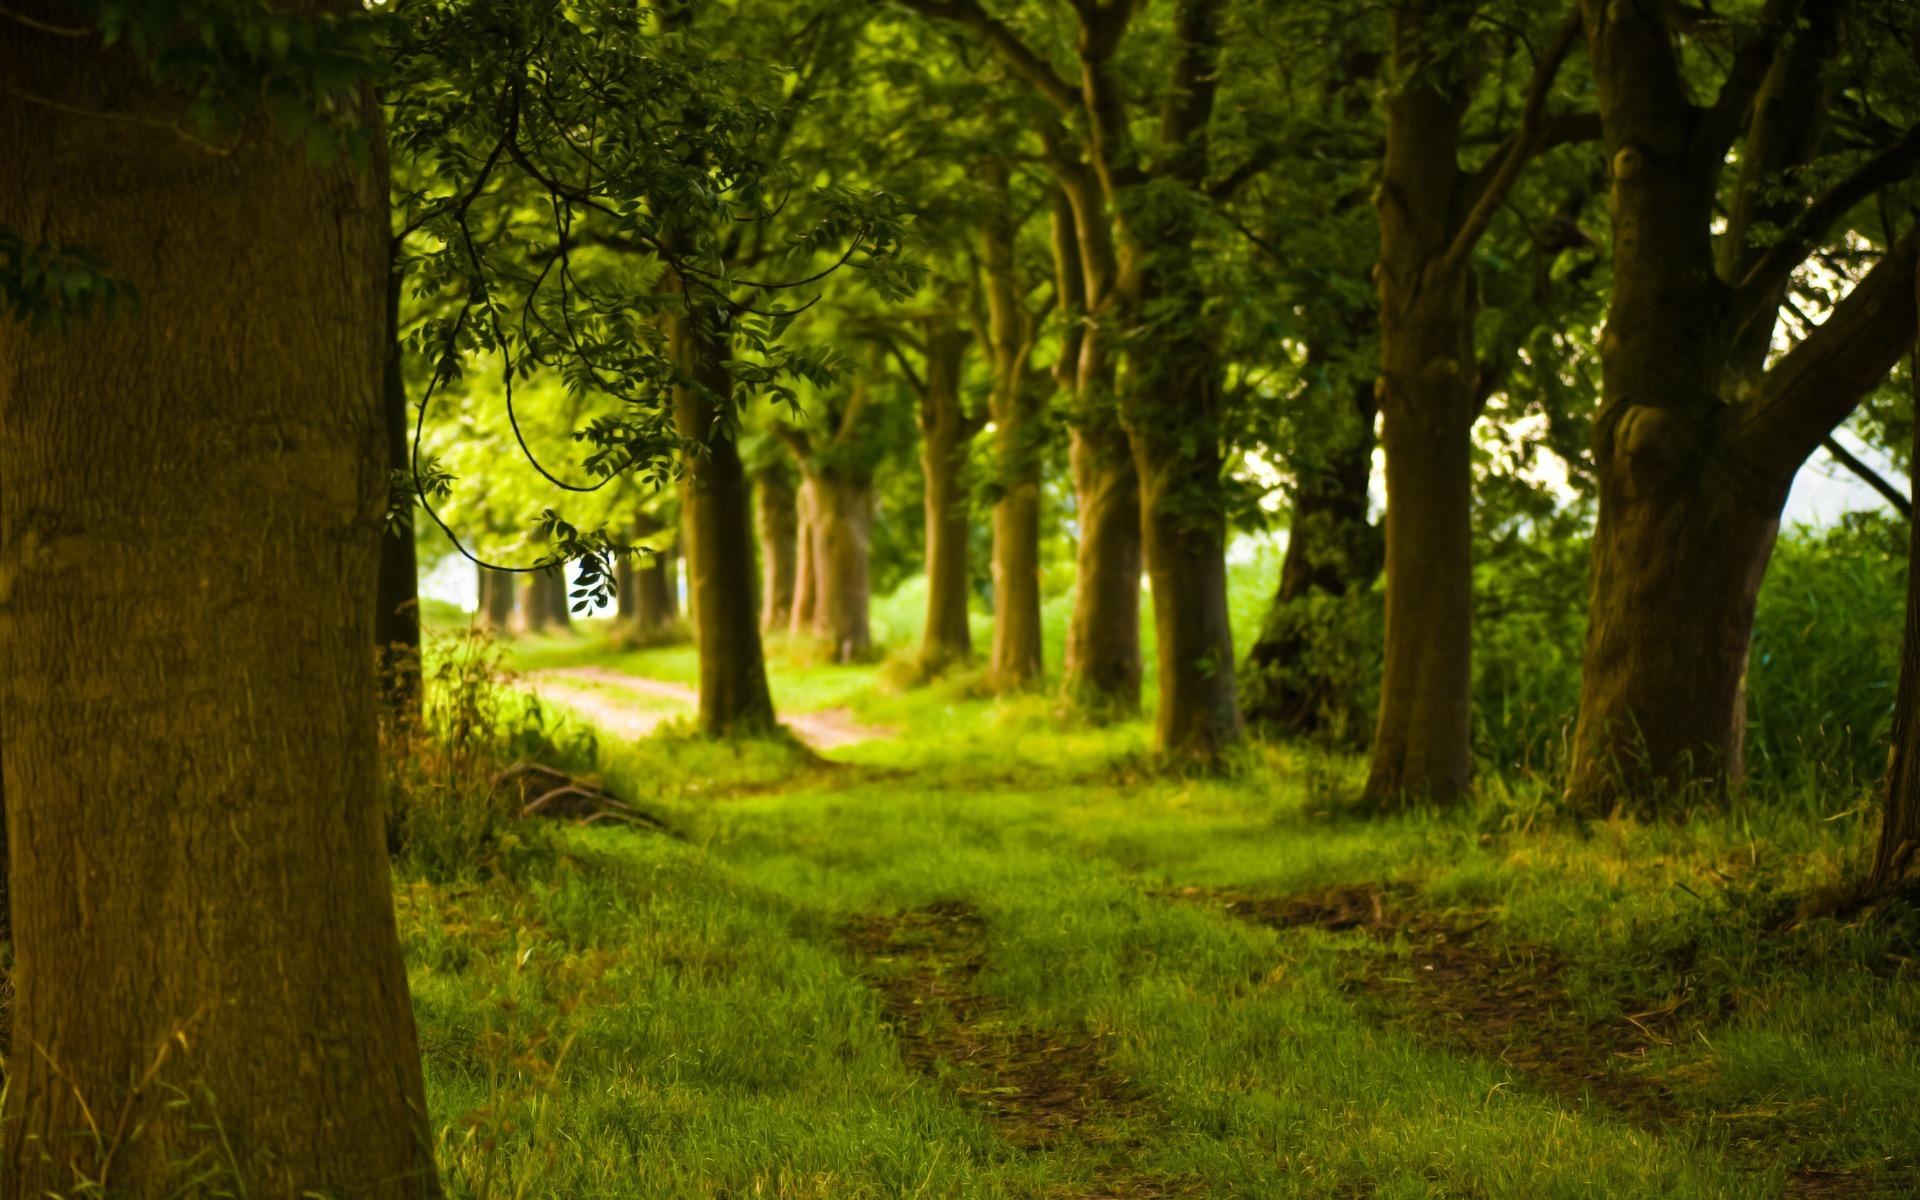 Tree HD Wallpaper